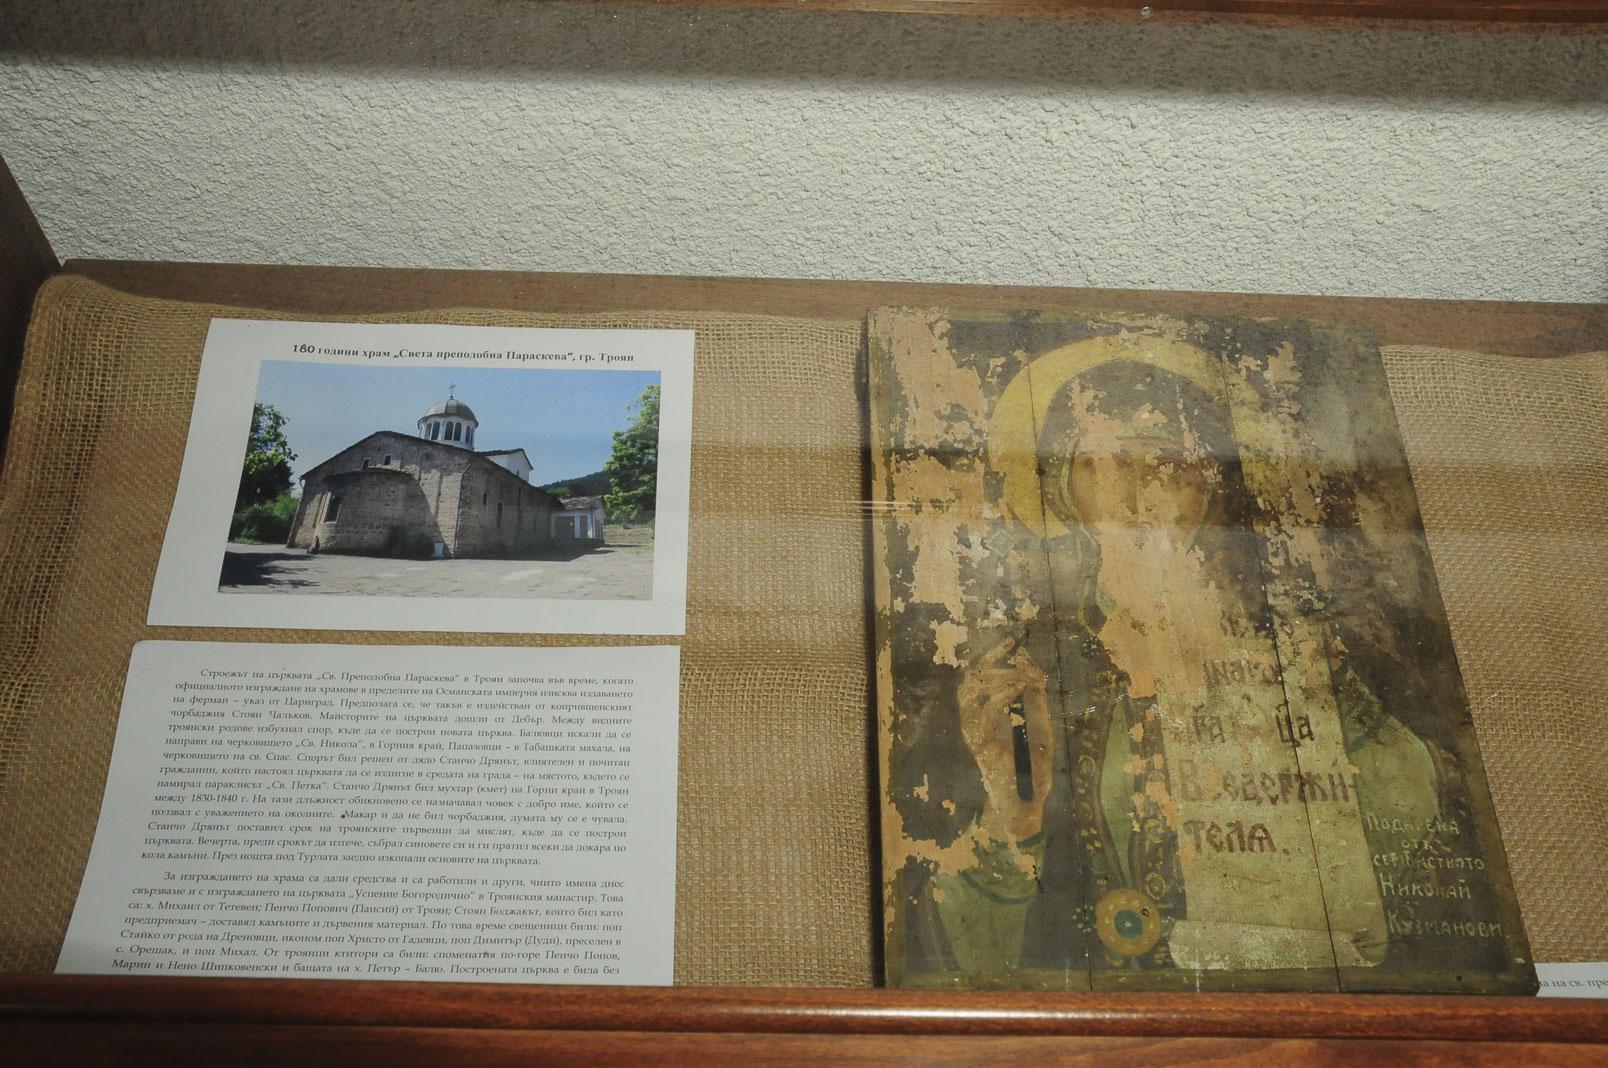 troyan-museum-180-godini-hram-cveta-paraskeva-1